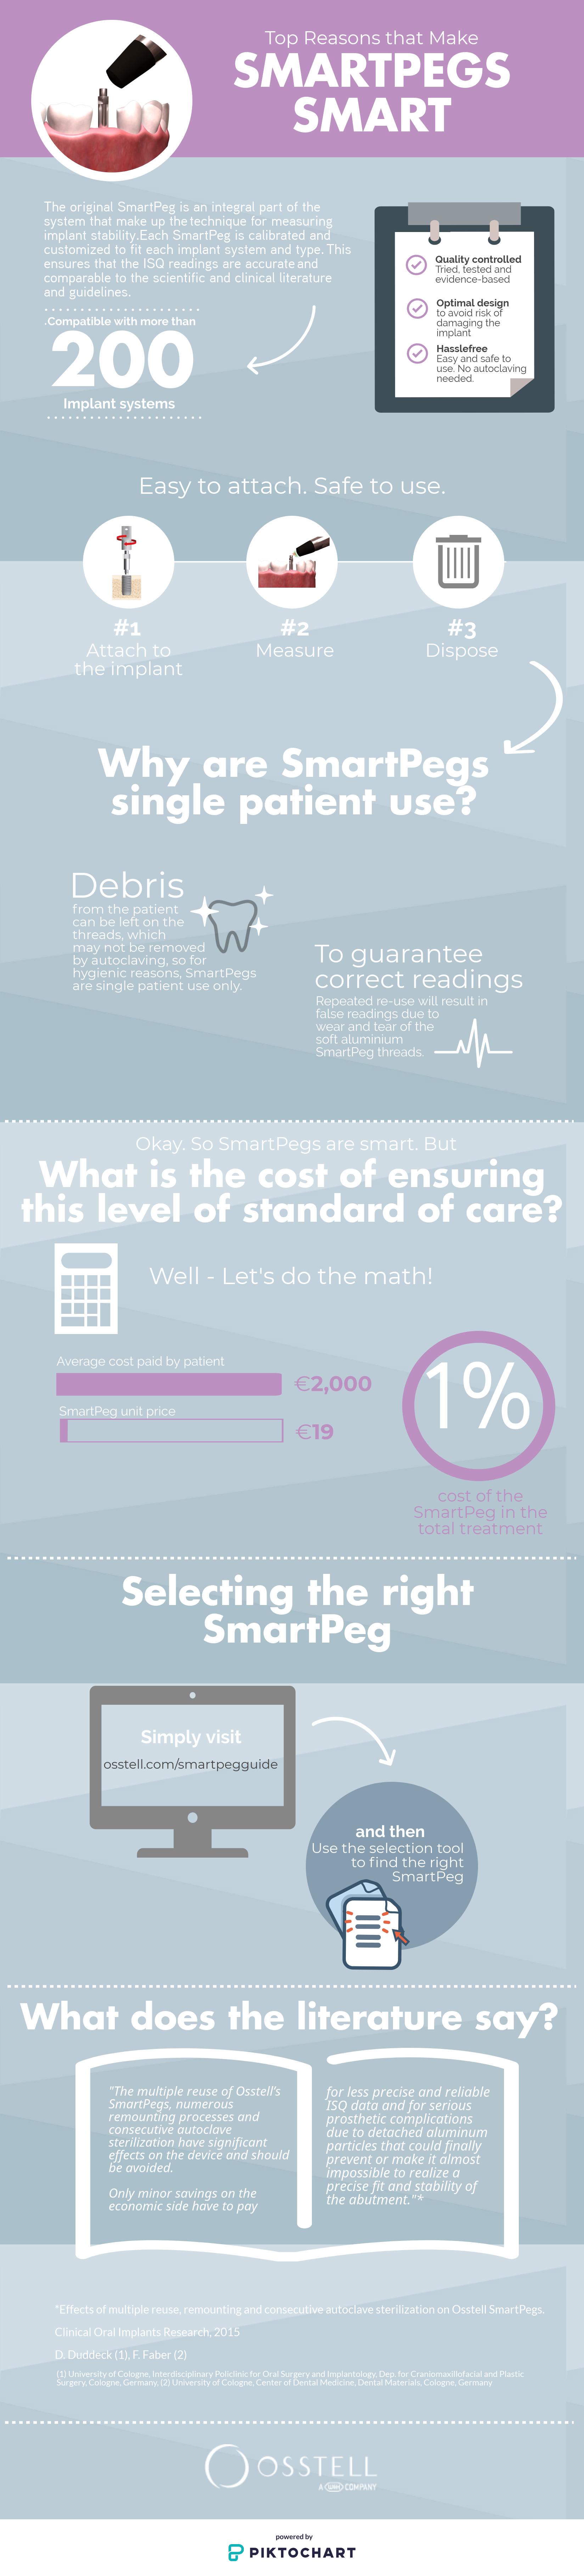 Top Reasons that make SmartPegs Smart - Final-1